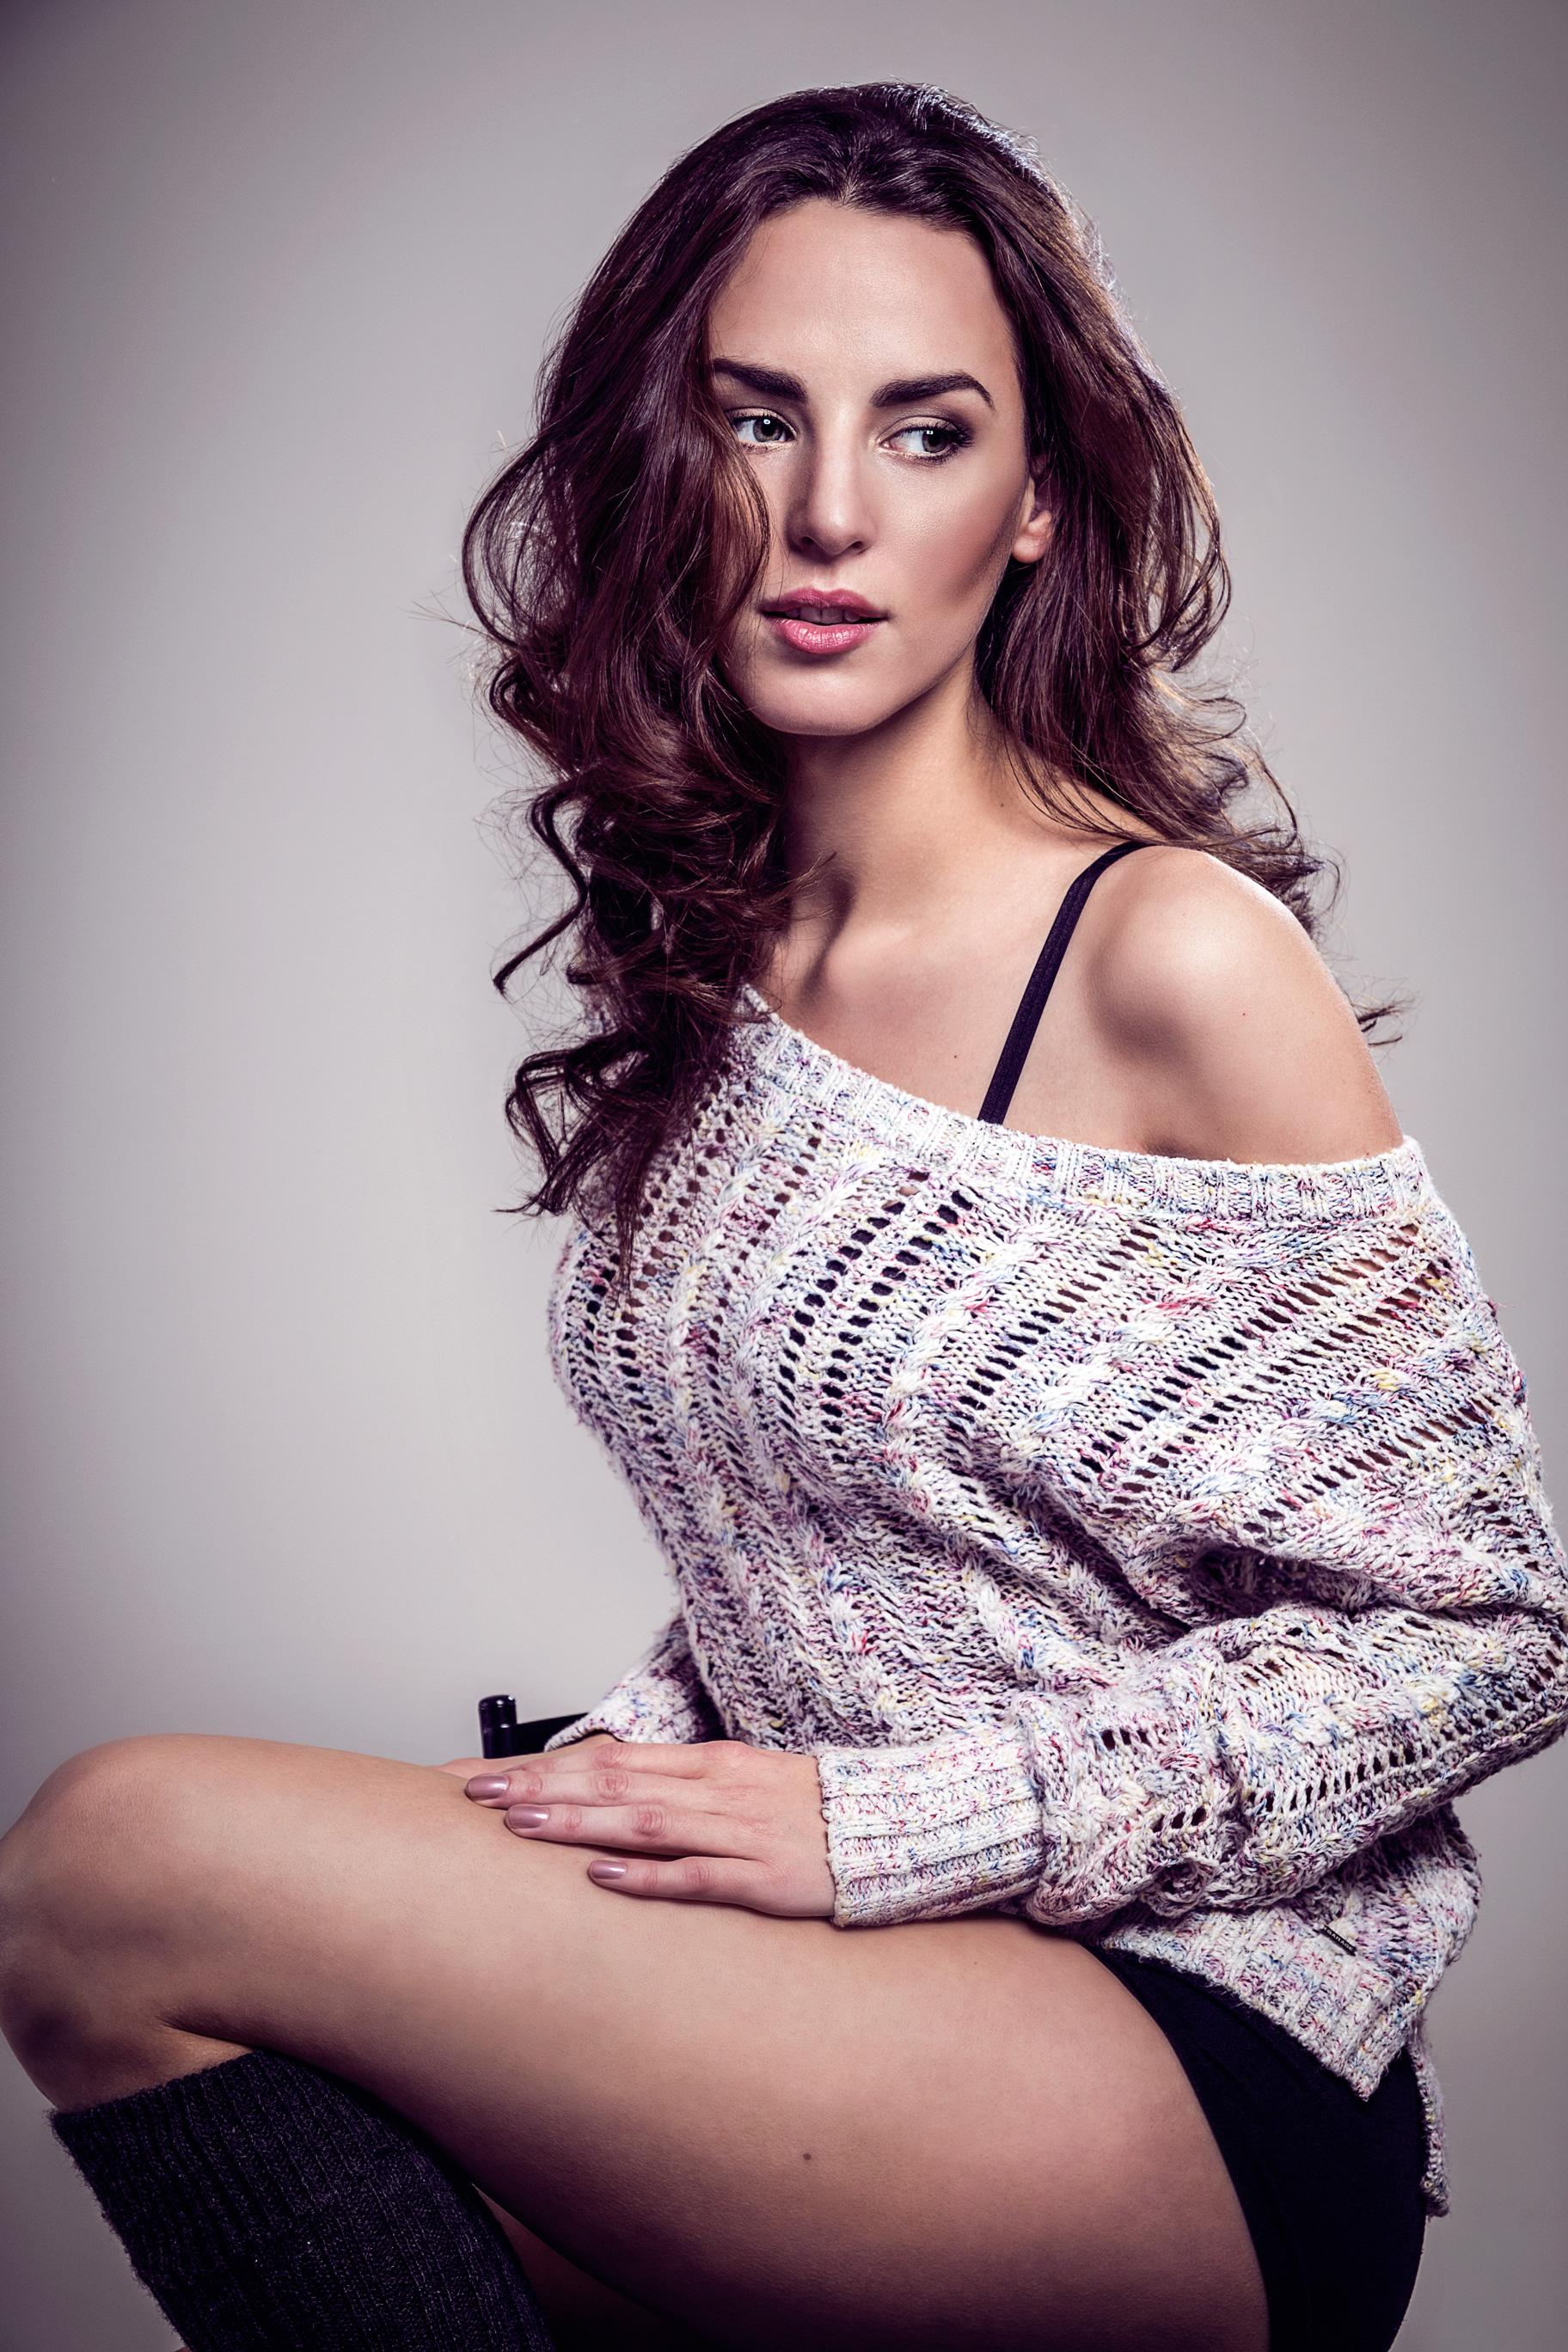 Model-Portrait-Photography-Montreal-Sarah-Chinerman-02.jpg